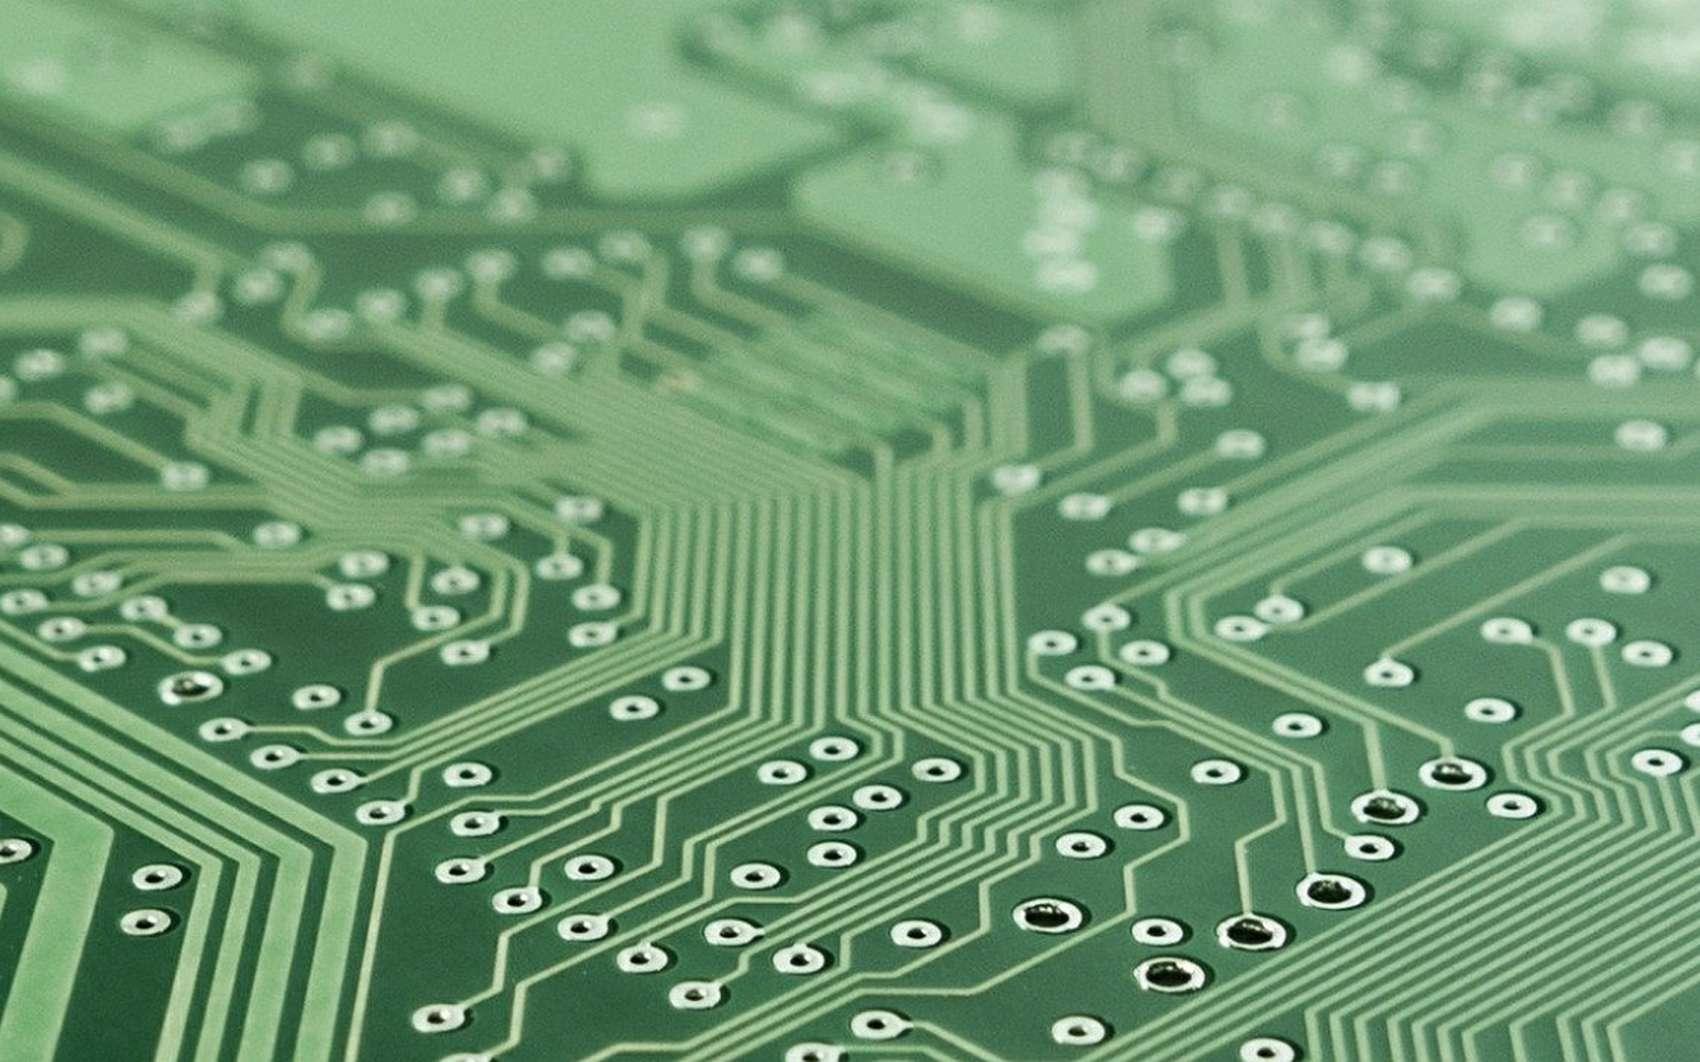 DAC est l'acronyme de Digital to Analog Converter © blickpixel, Pixabay